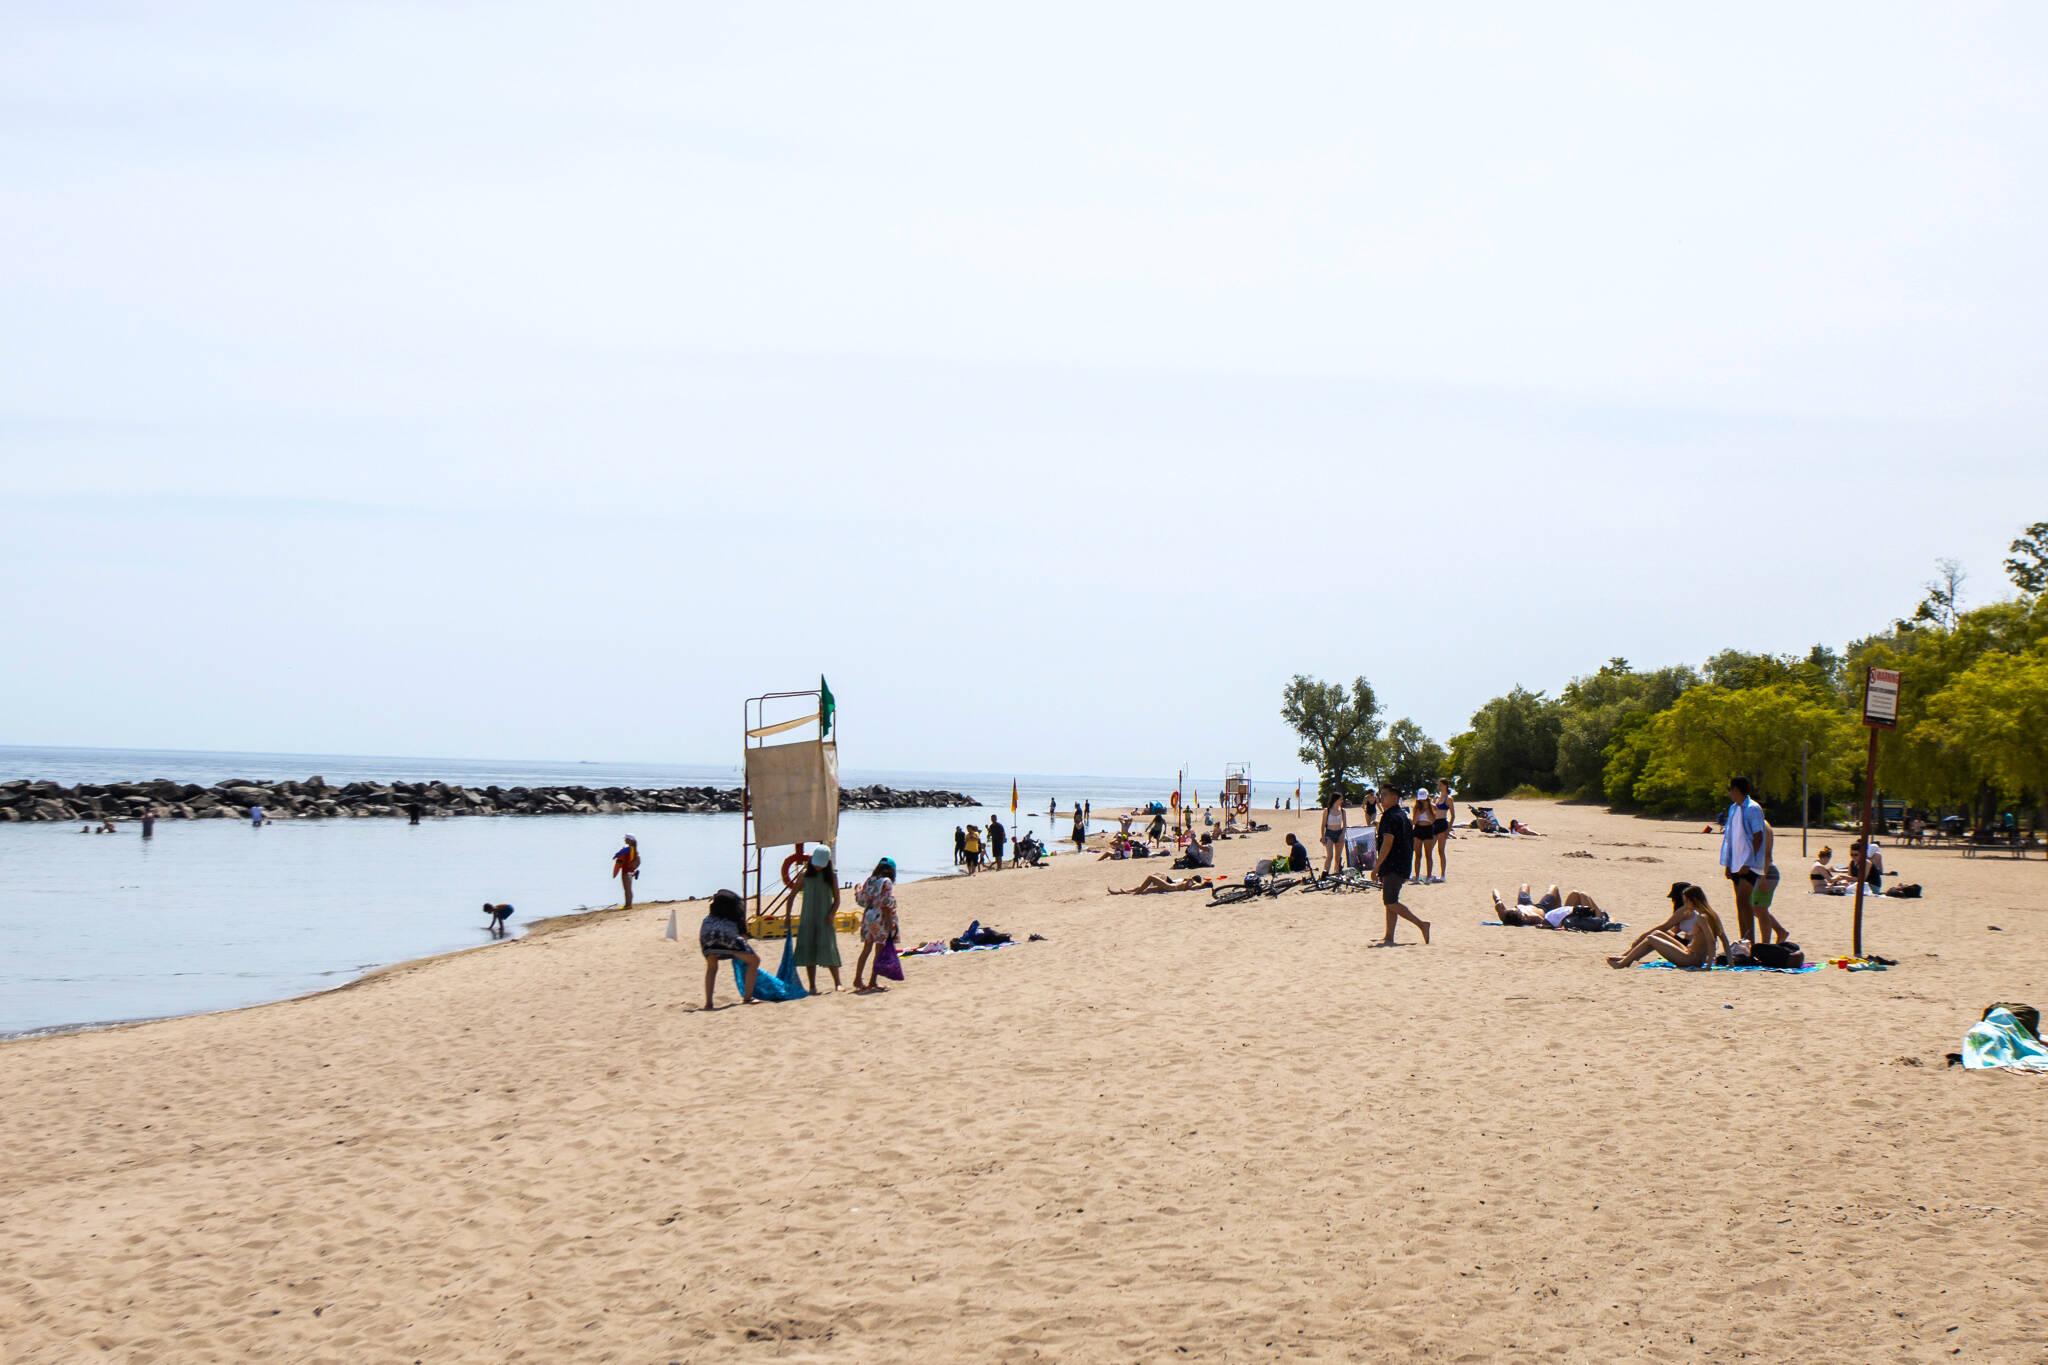 centre island beach